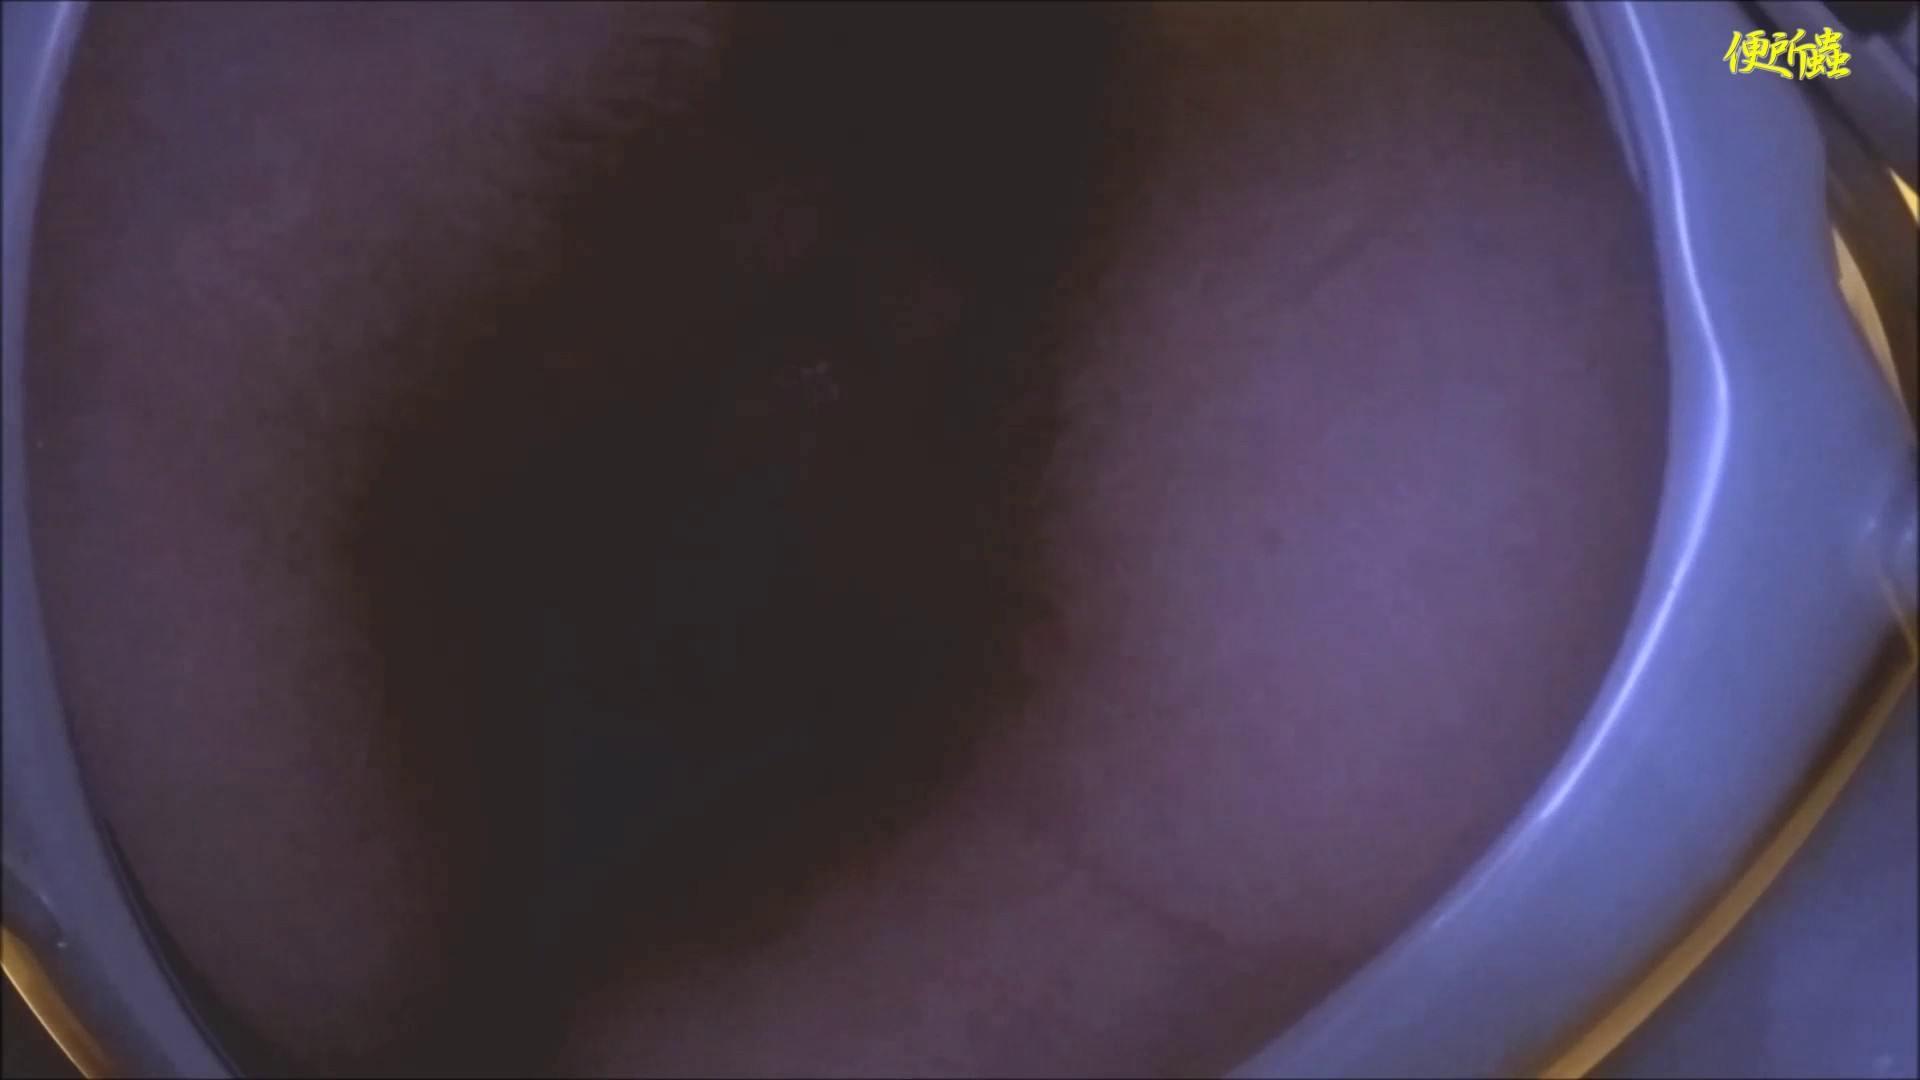 vol.07 便所蟲さんのリターン~寺子屋洗面所盗撮~※画質改善※総勢7名 盗撮・必見 濡れ場動画紹介 79画像 34